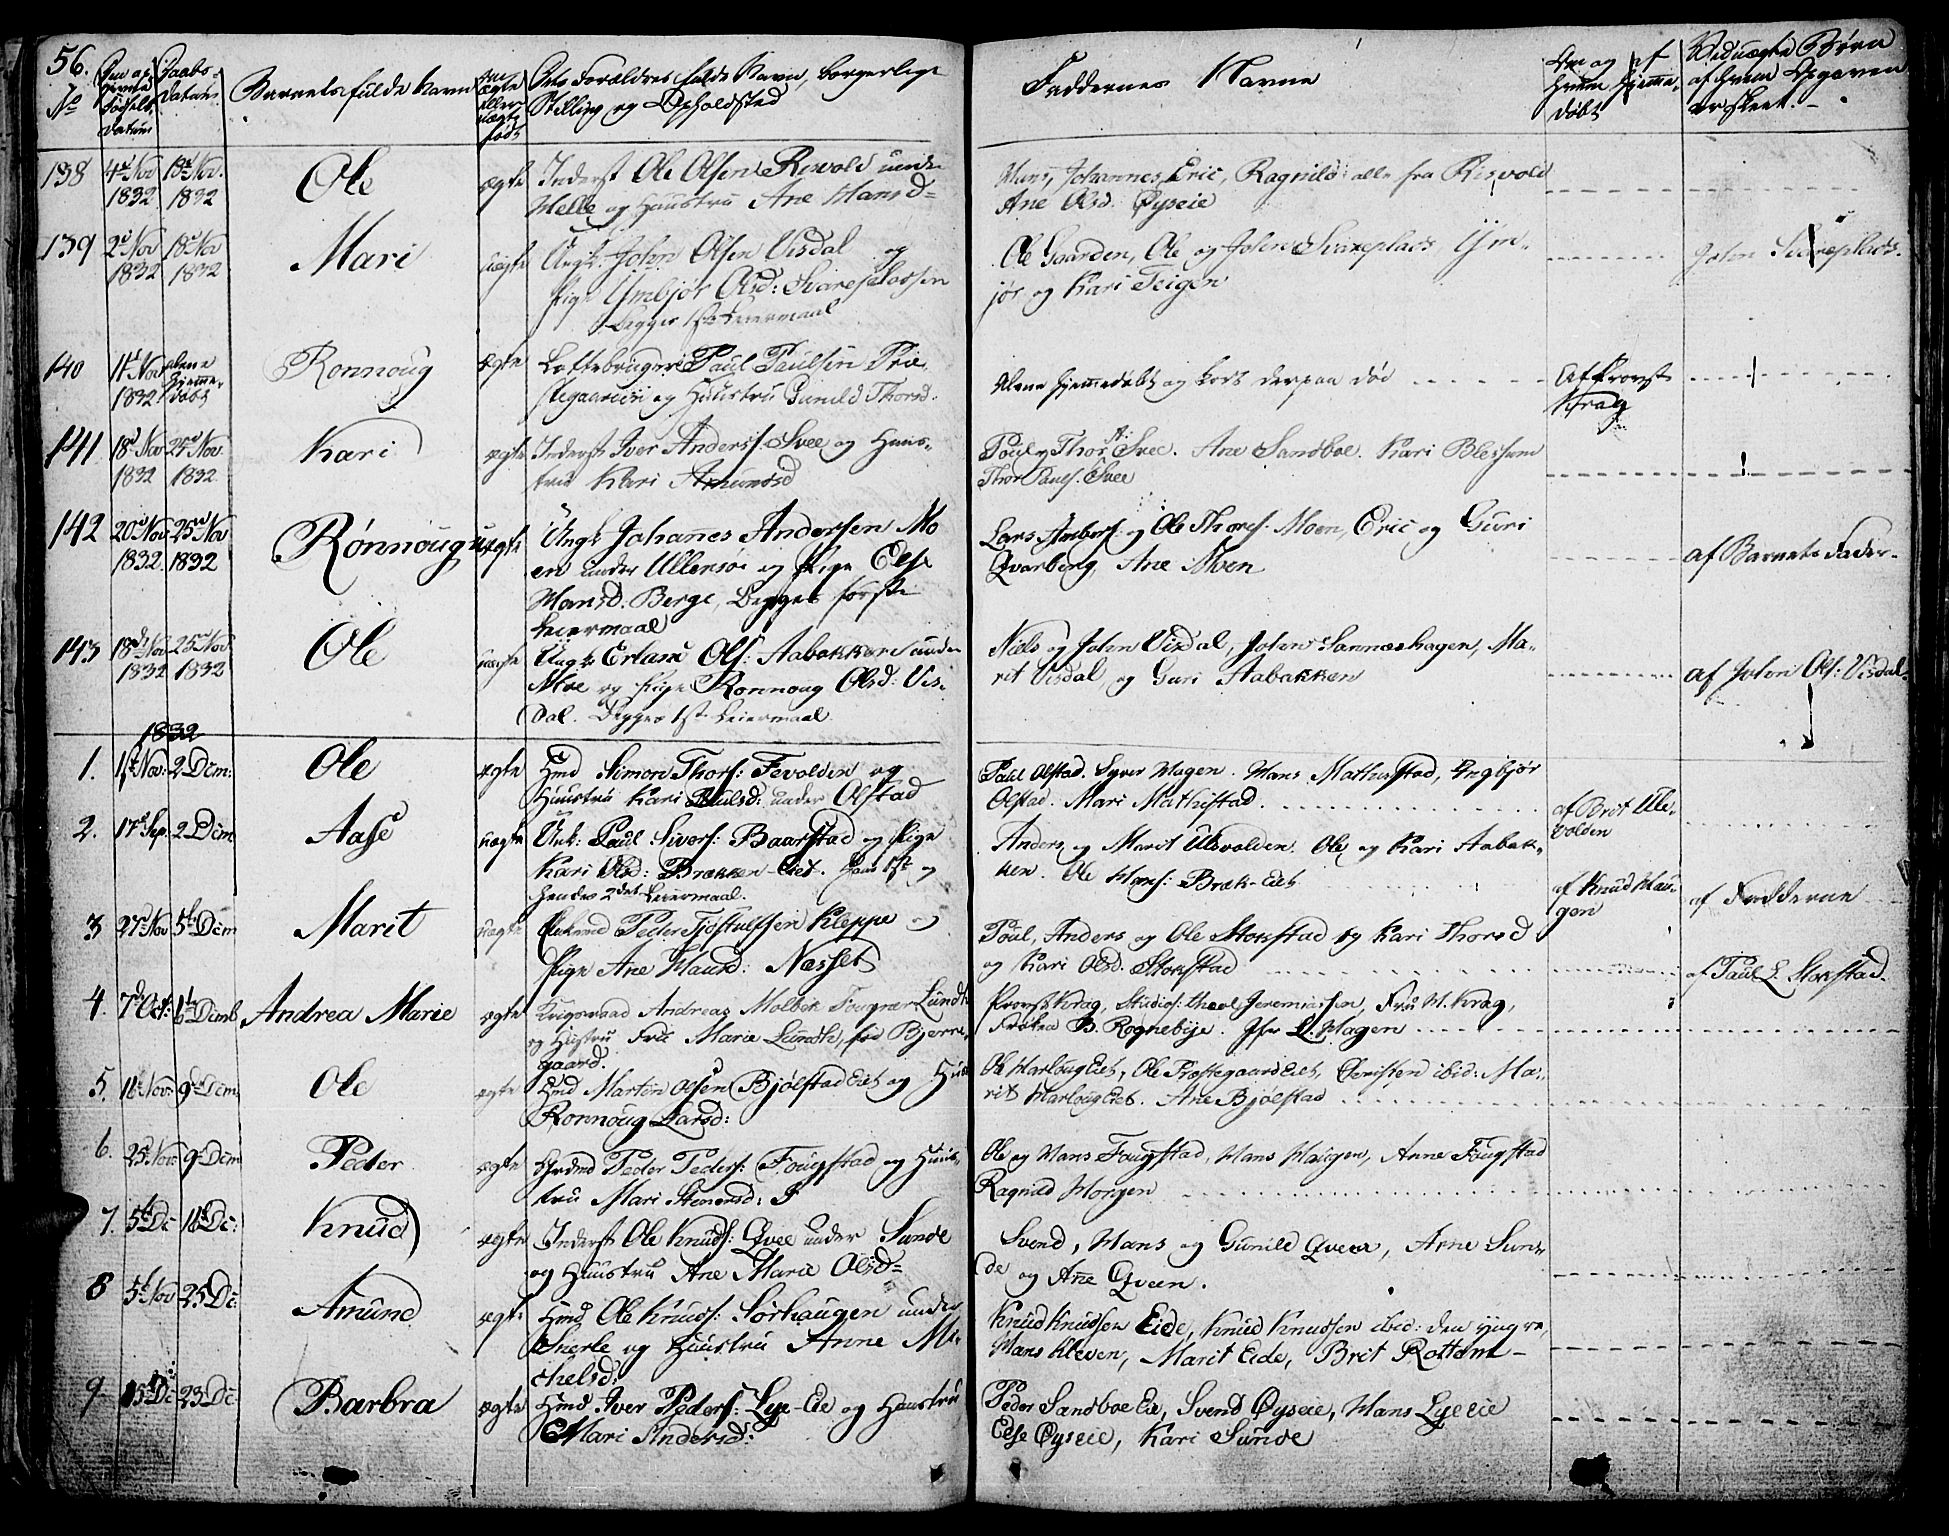 SAH, Vågå prestekontor, Ministerialbok nr. 4 /1, 1827-1842, s. 56